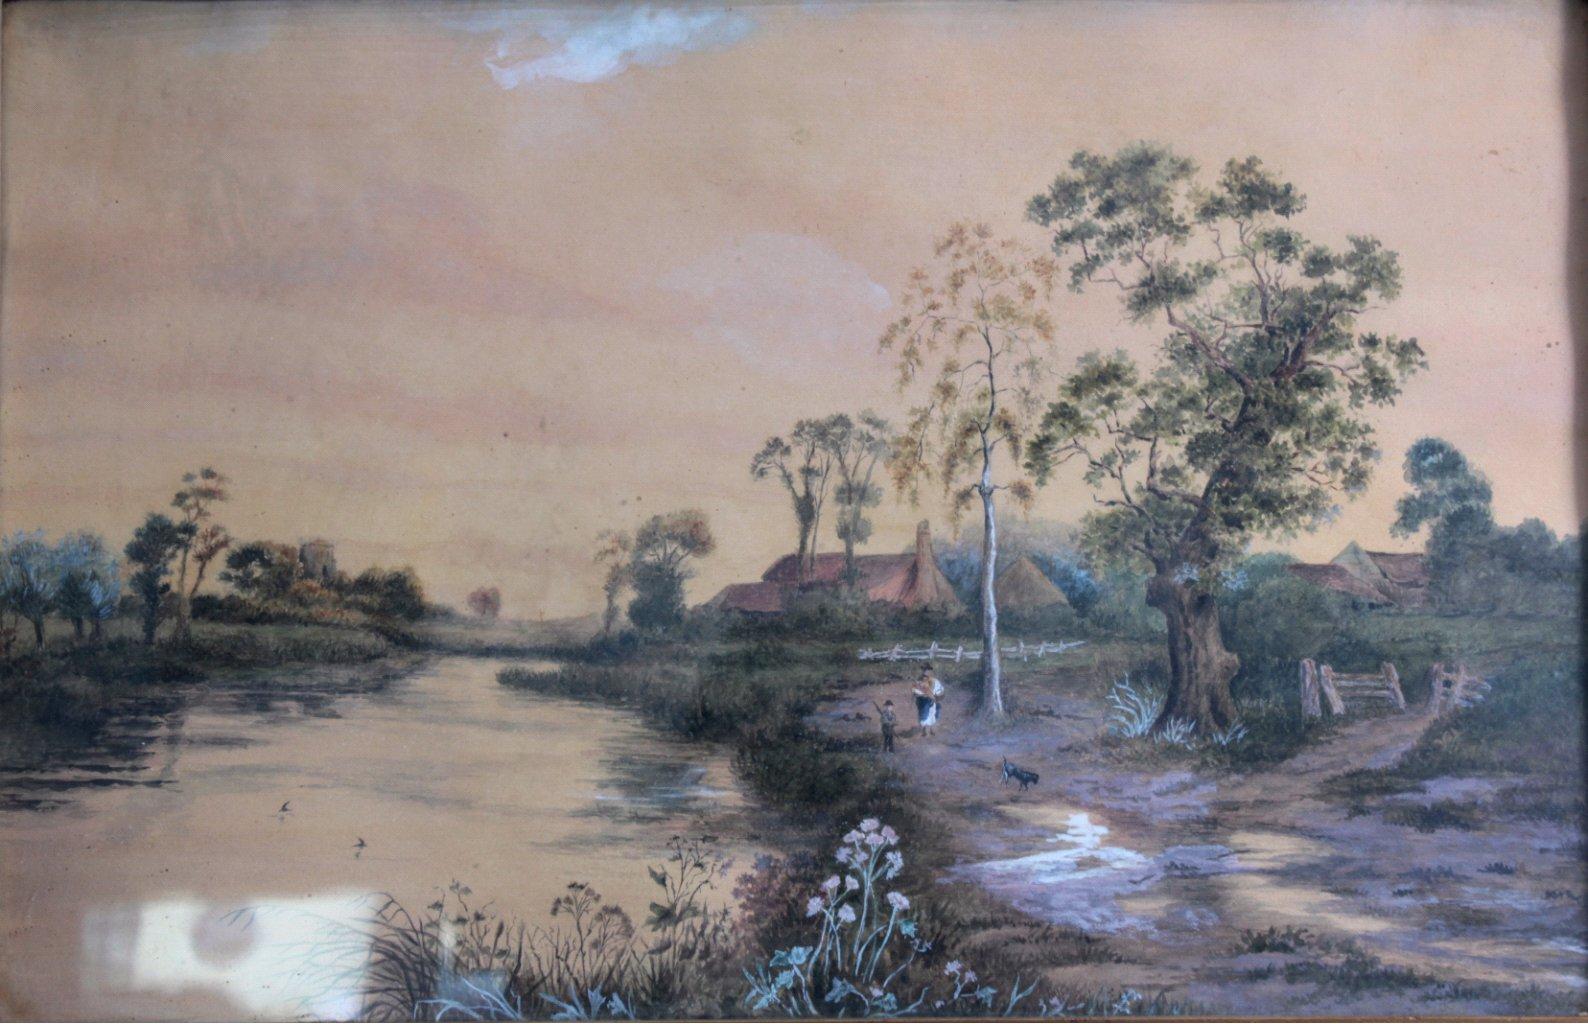 Aquarell 19. Jahrhundert-1